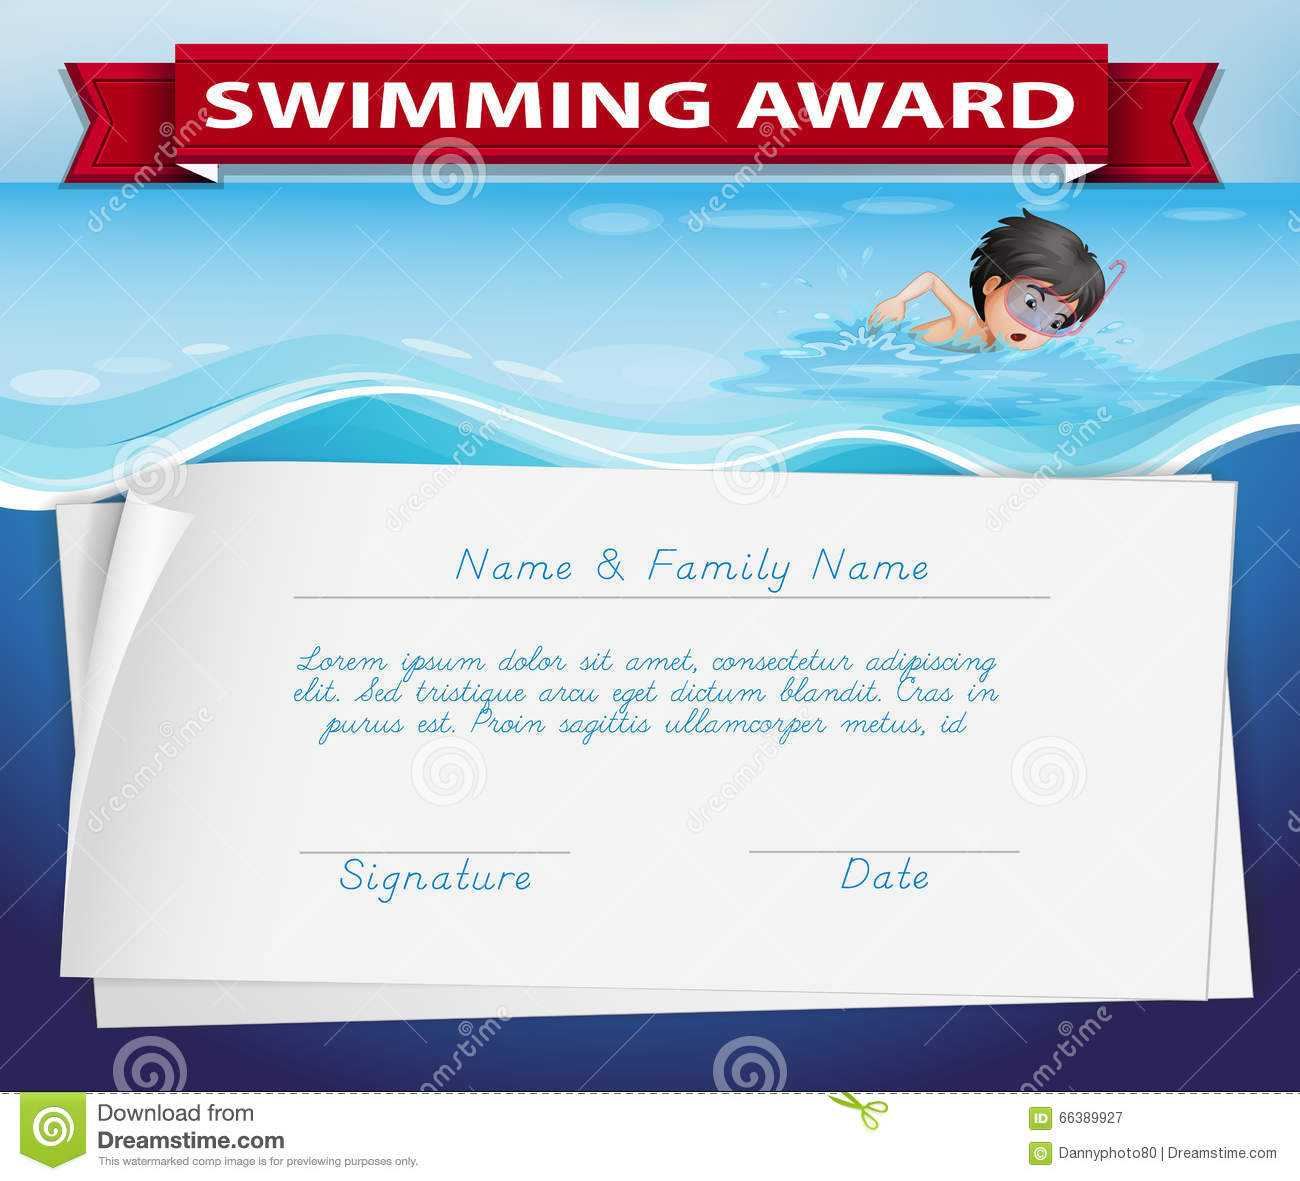 Template Certificate Swimming Award Stock Illustrations – 18 Within Free Swimming Certificate Templates